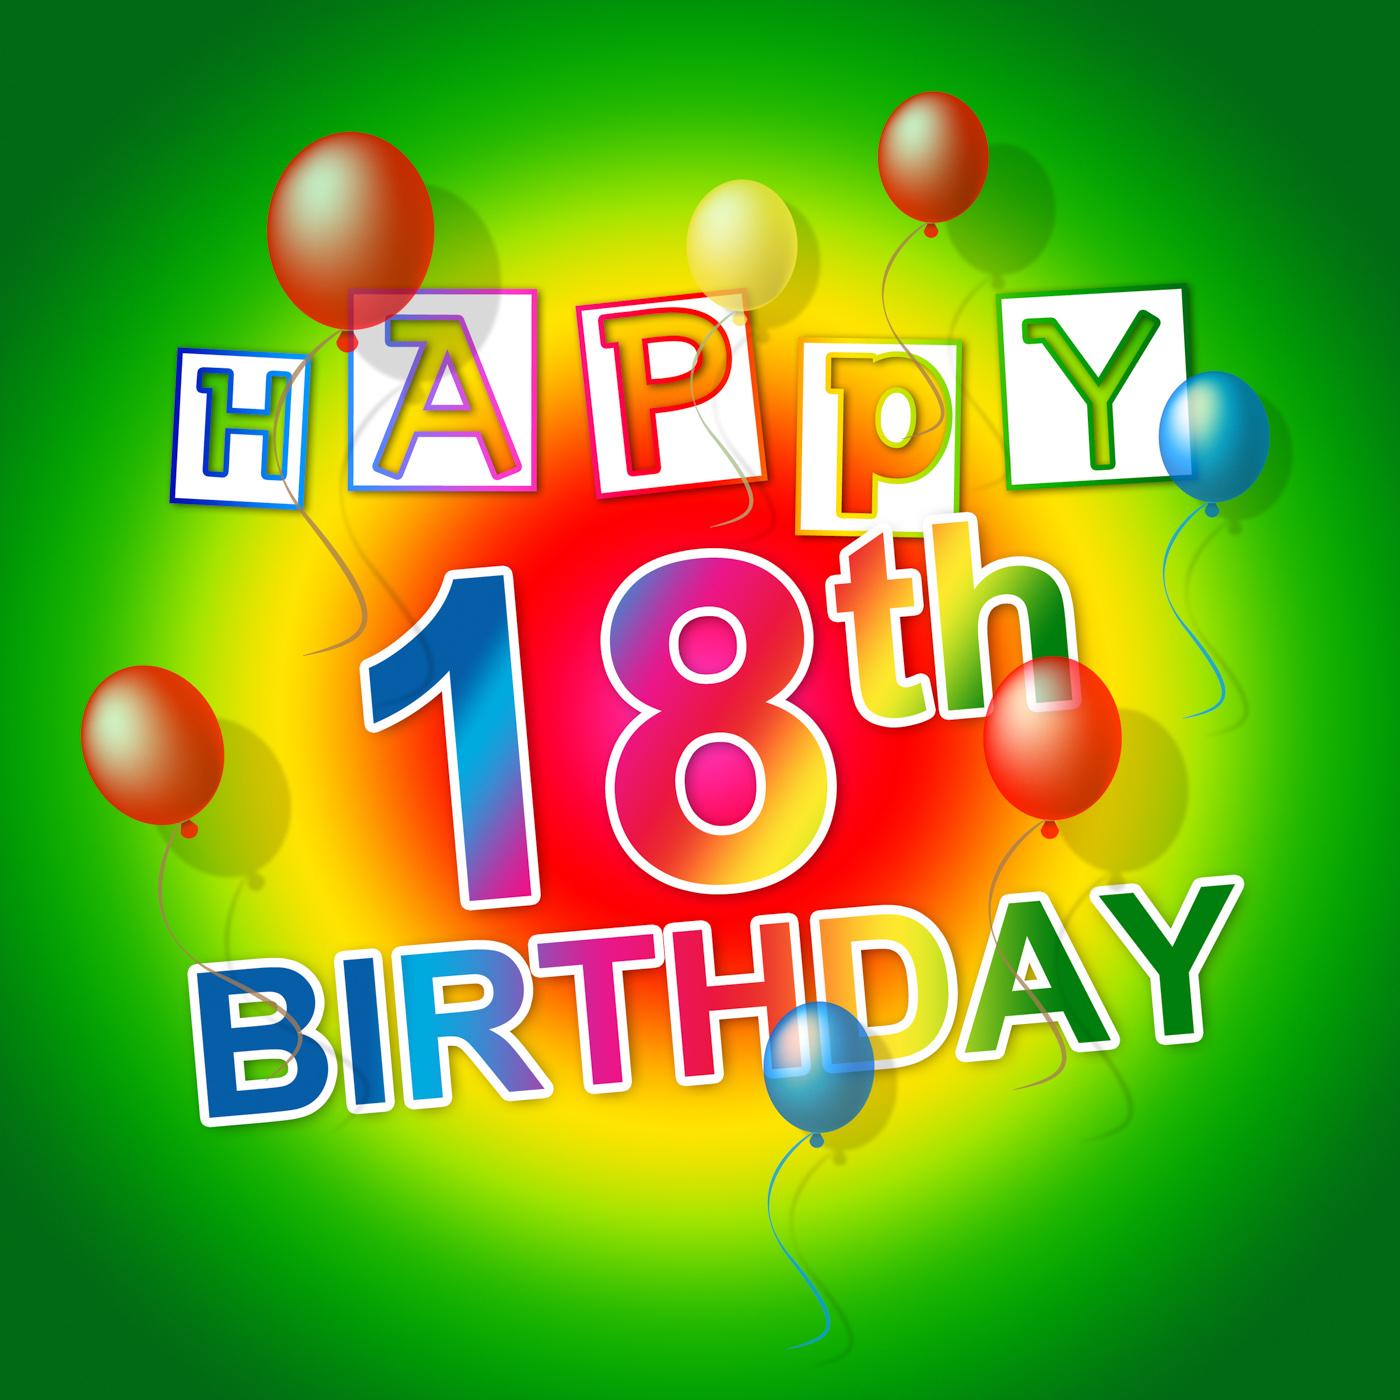 Happy birthday indicates 18th celebrate and eighteenth photo